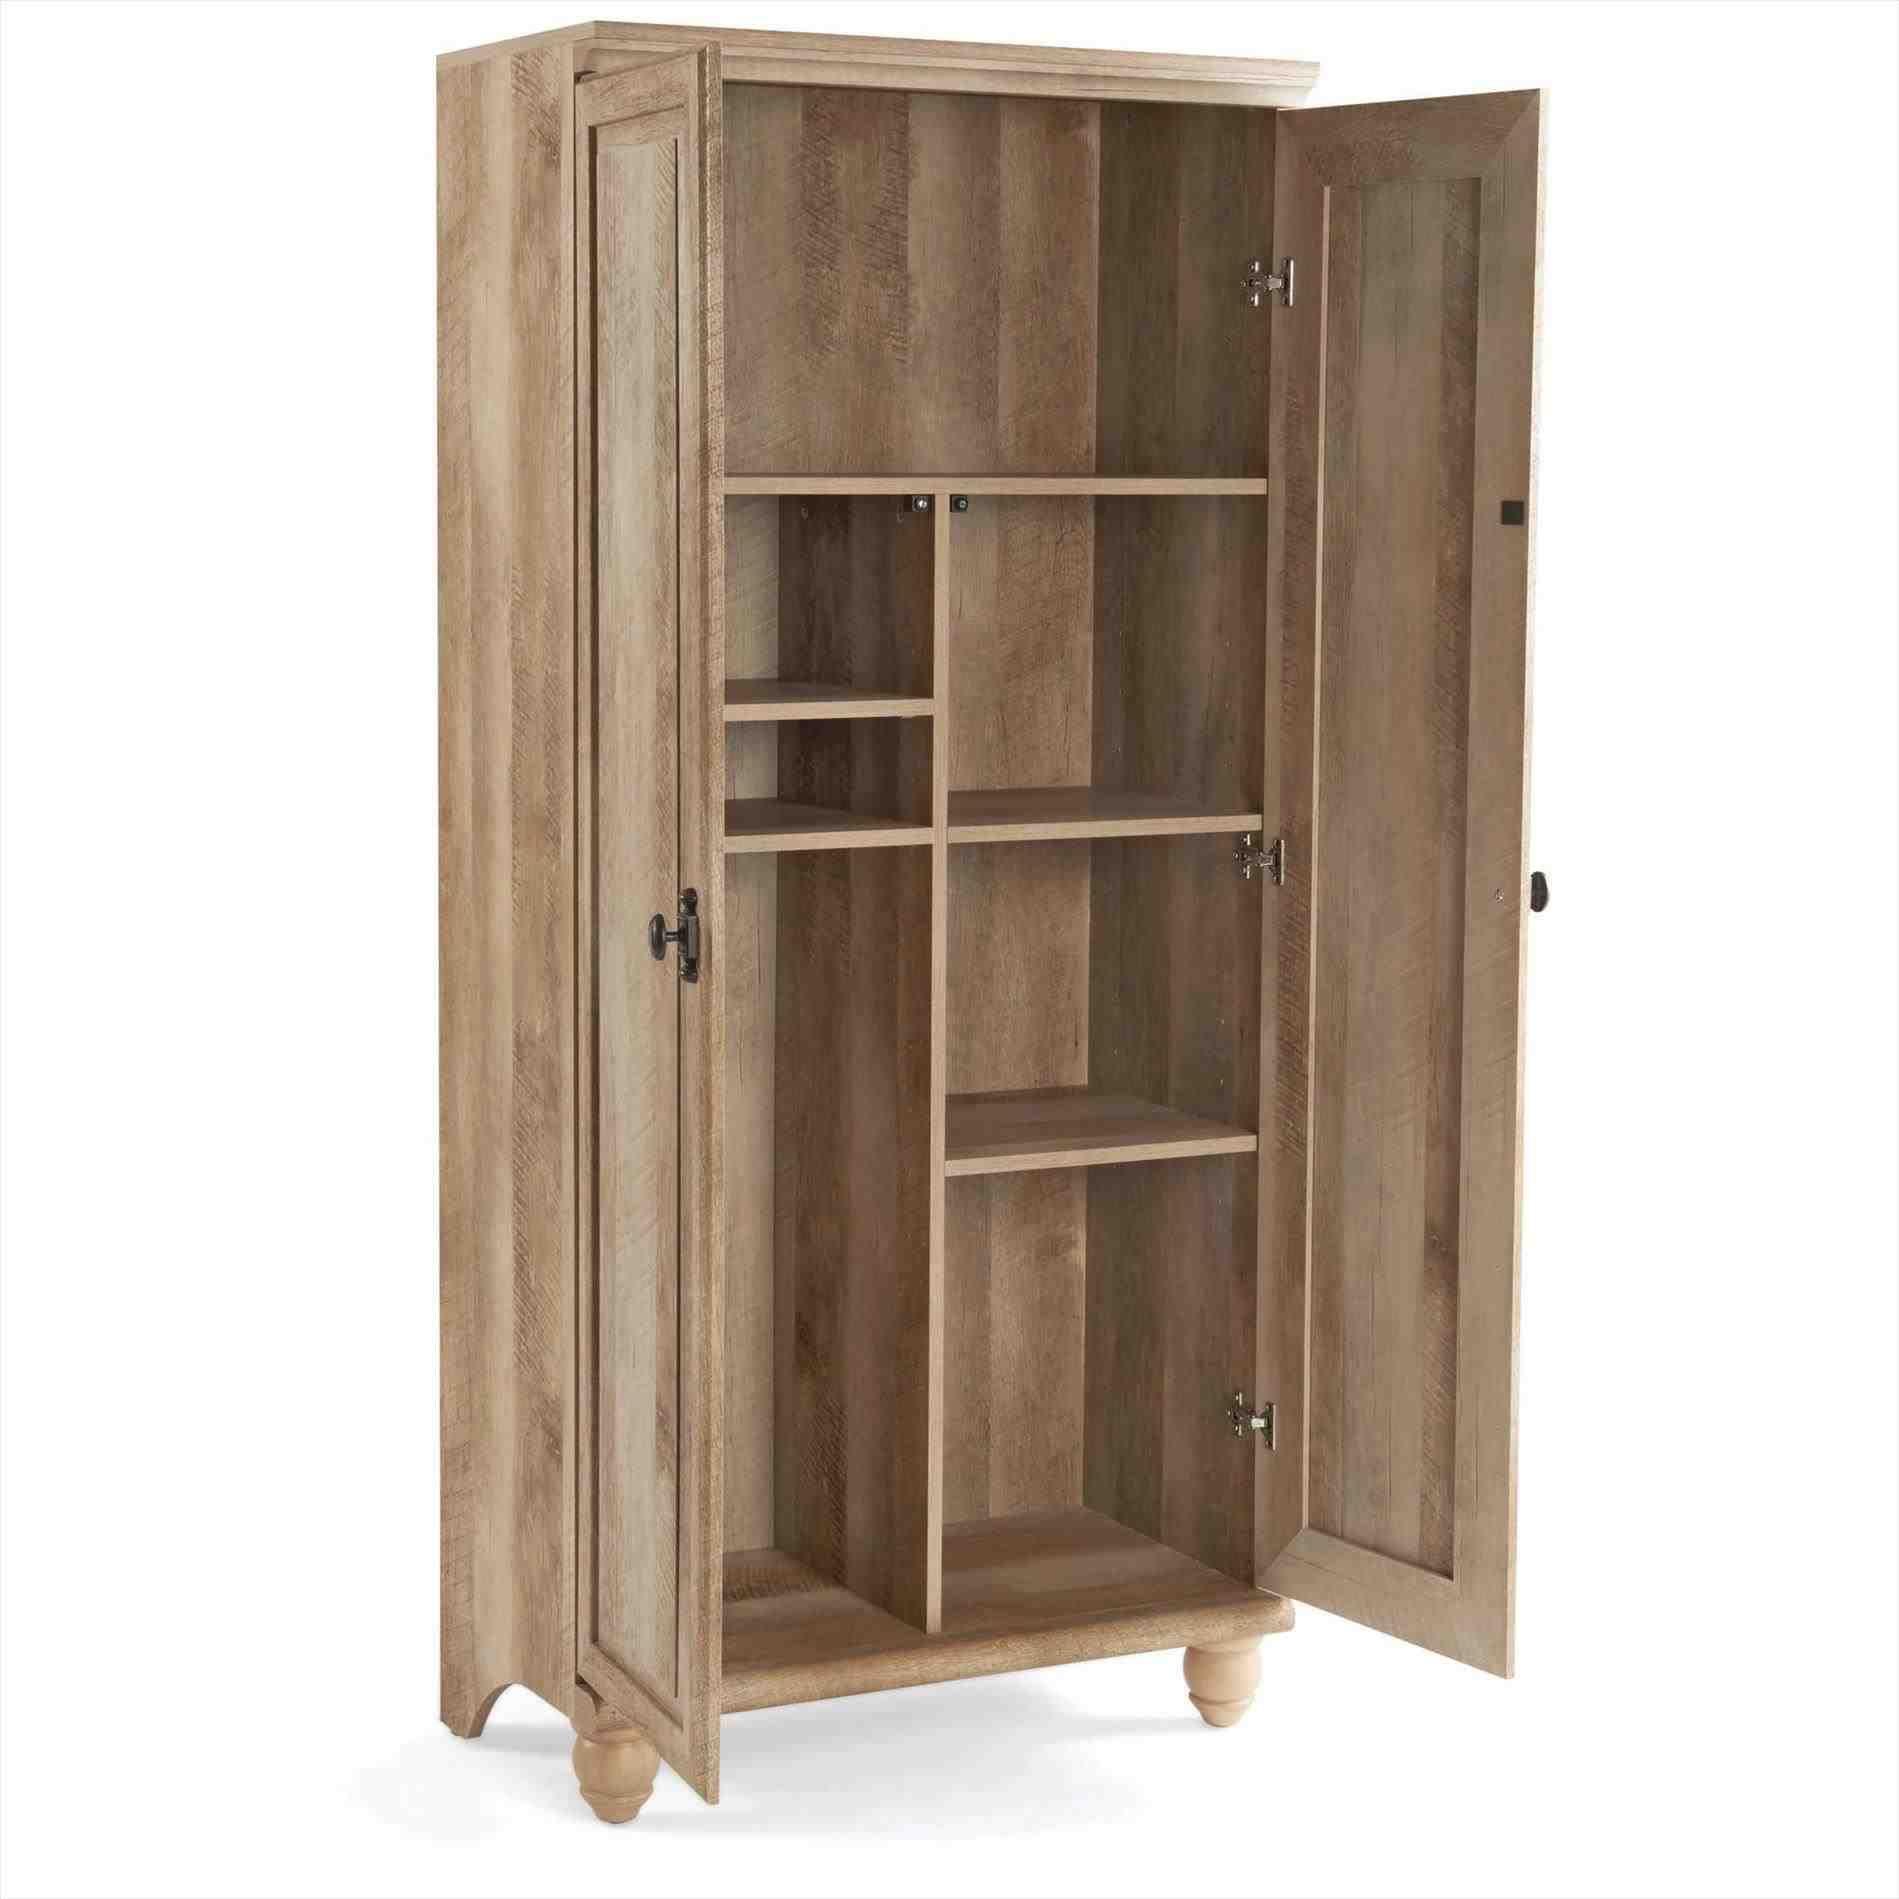 New post wardrobe shelving units decors ideas pinterest wardrobes